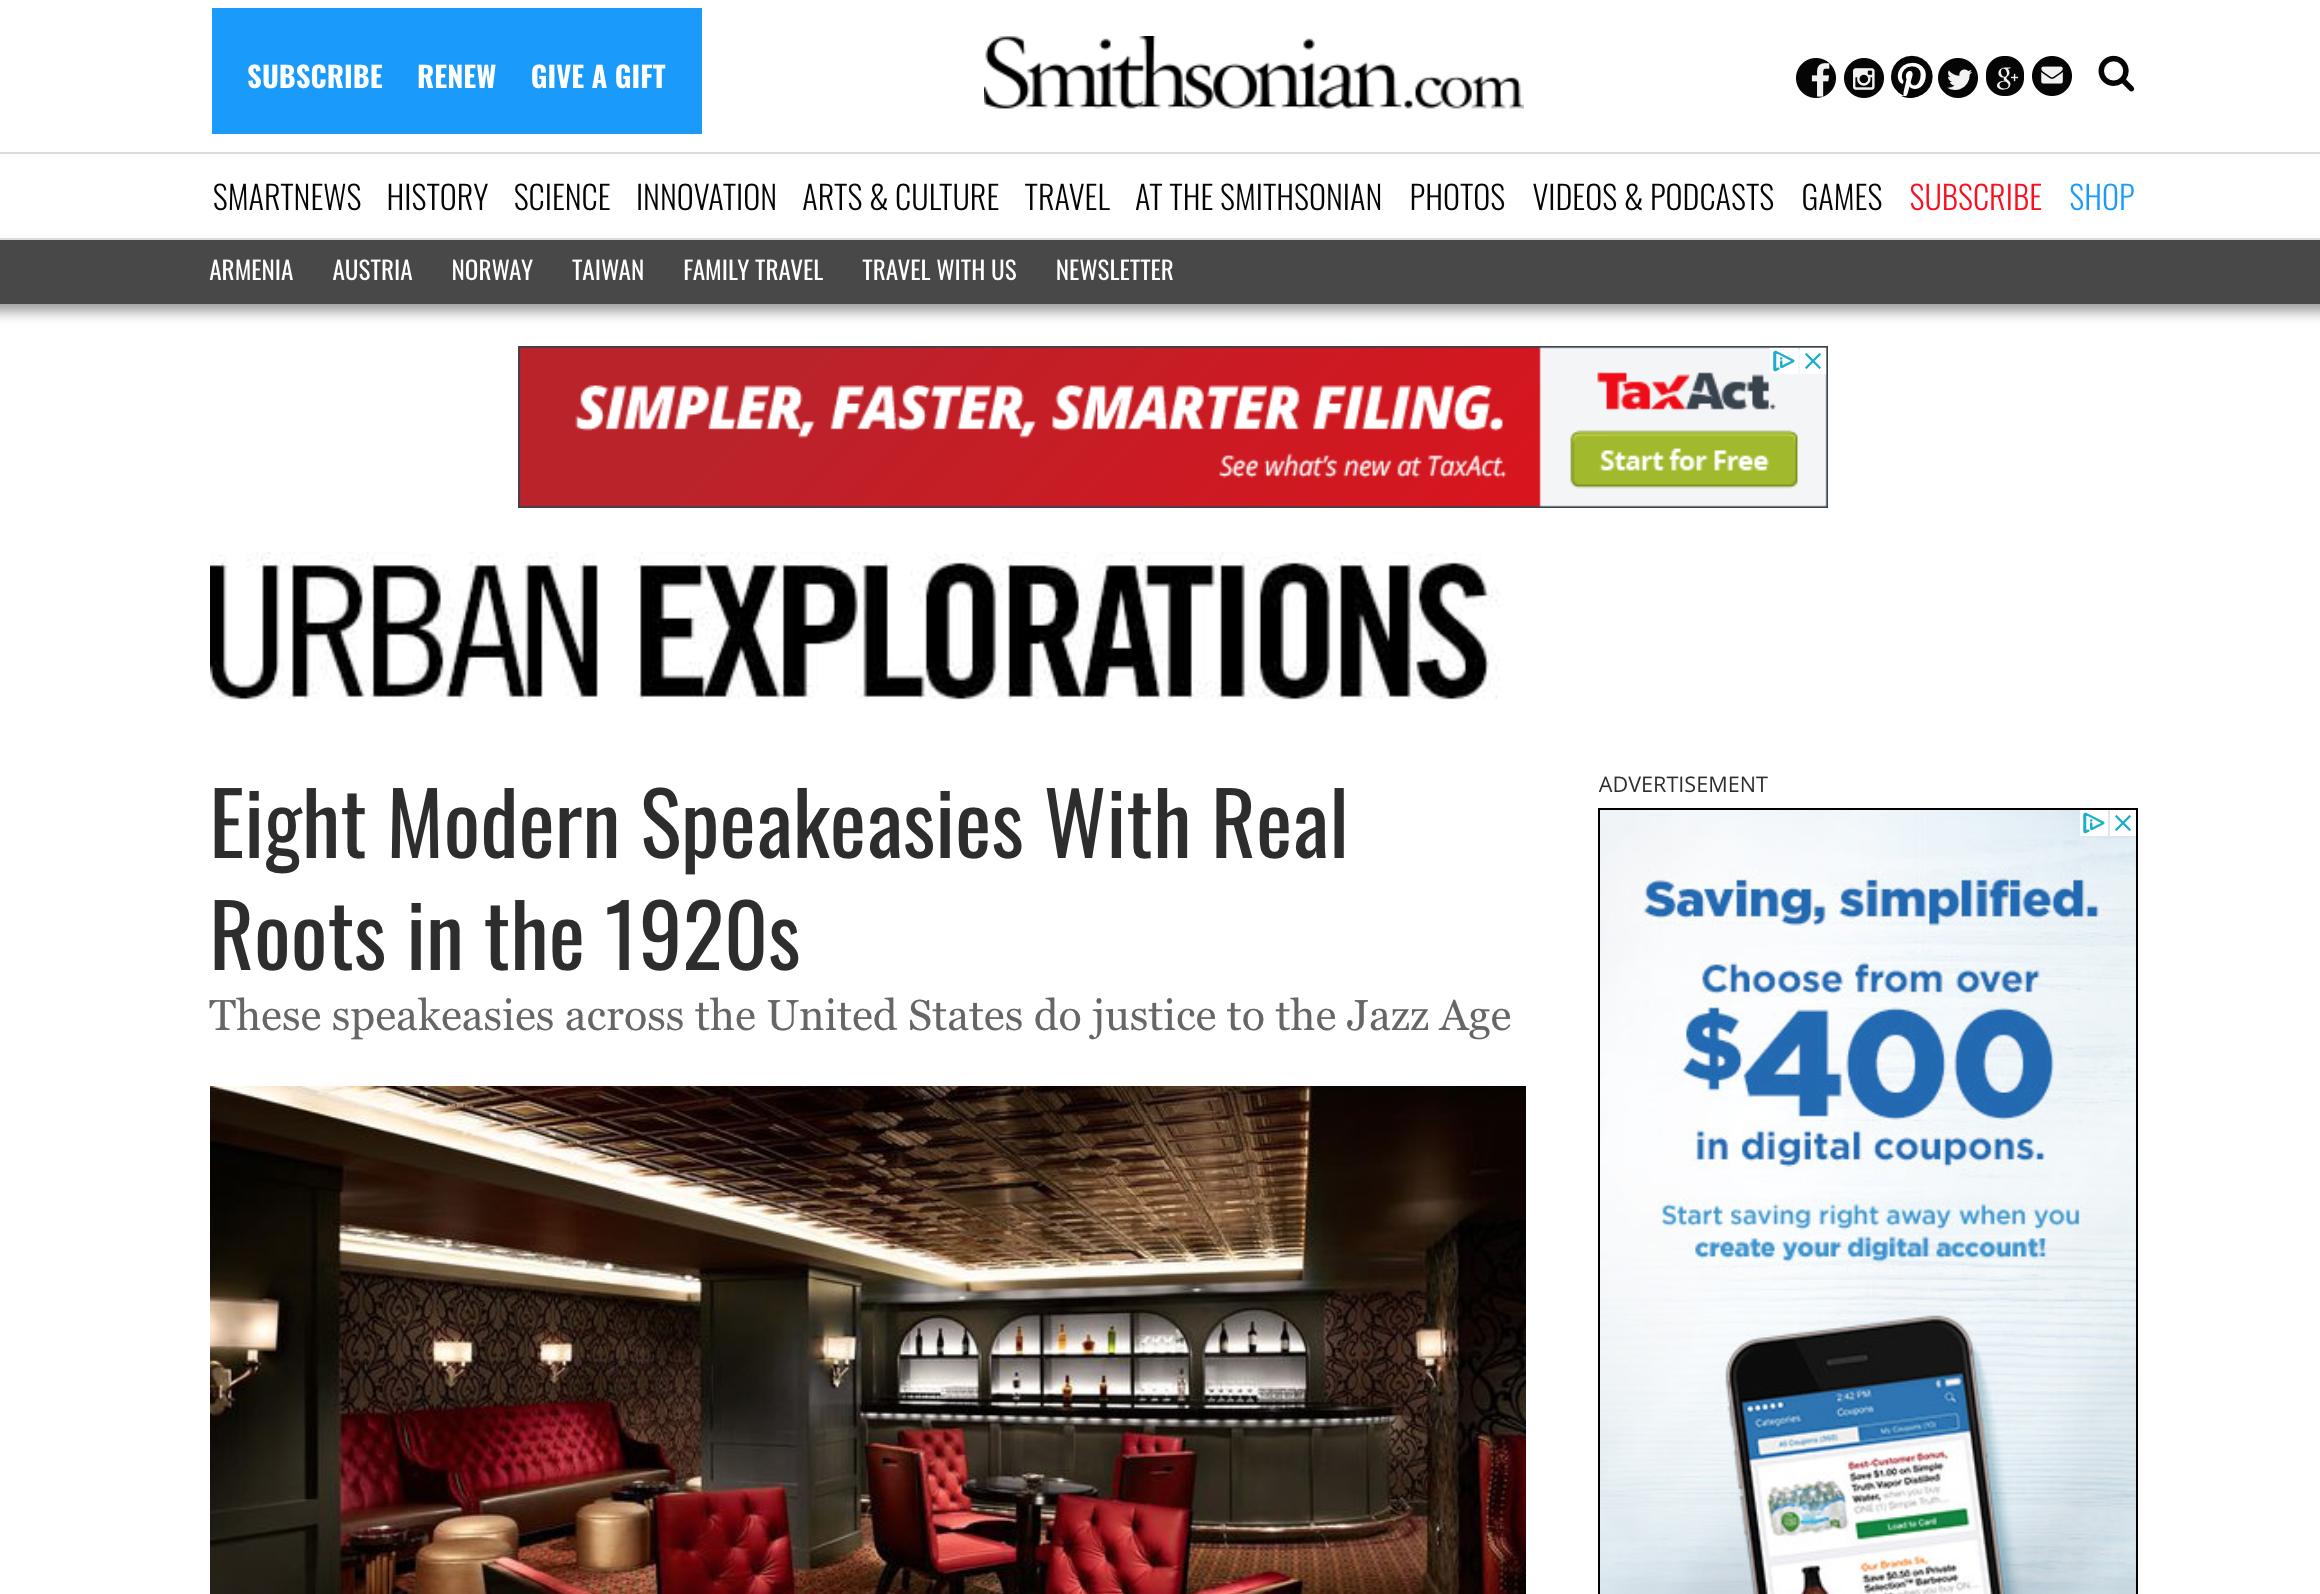 Smithsonian: Eight Modern Speakeasies